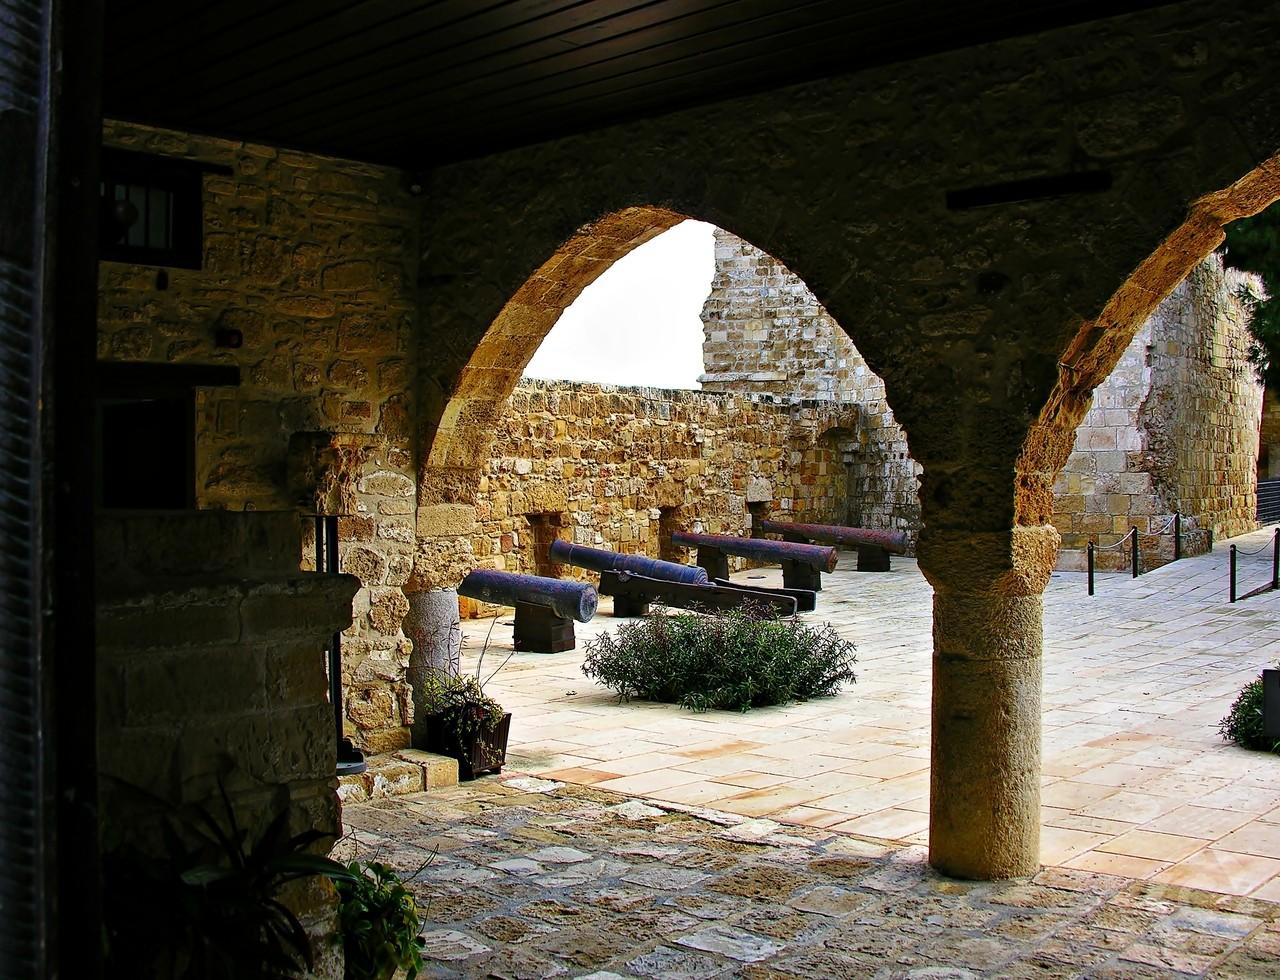 قلعه لارناکا قبرس